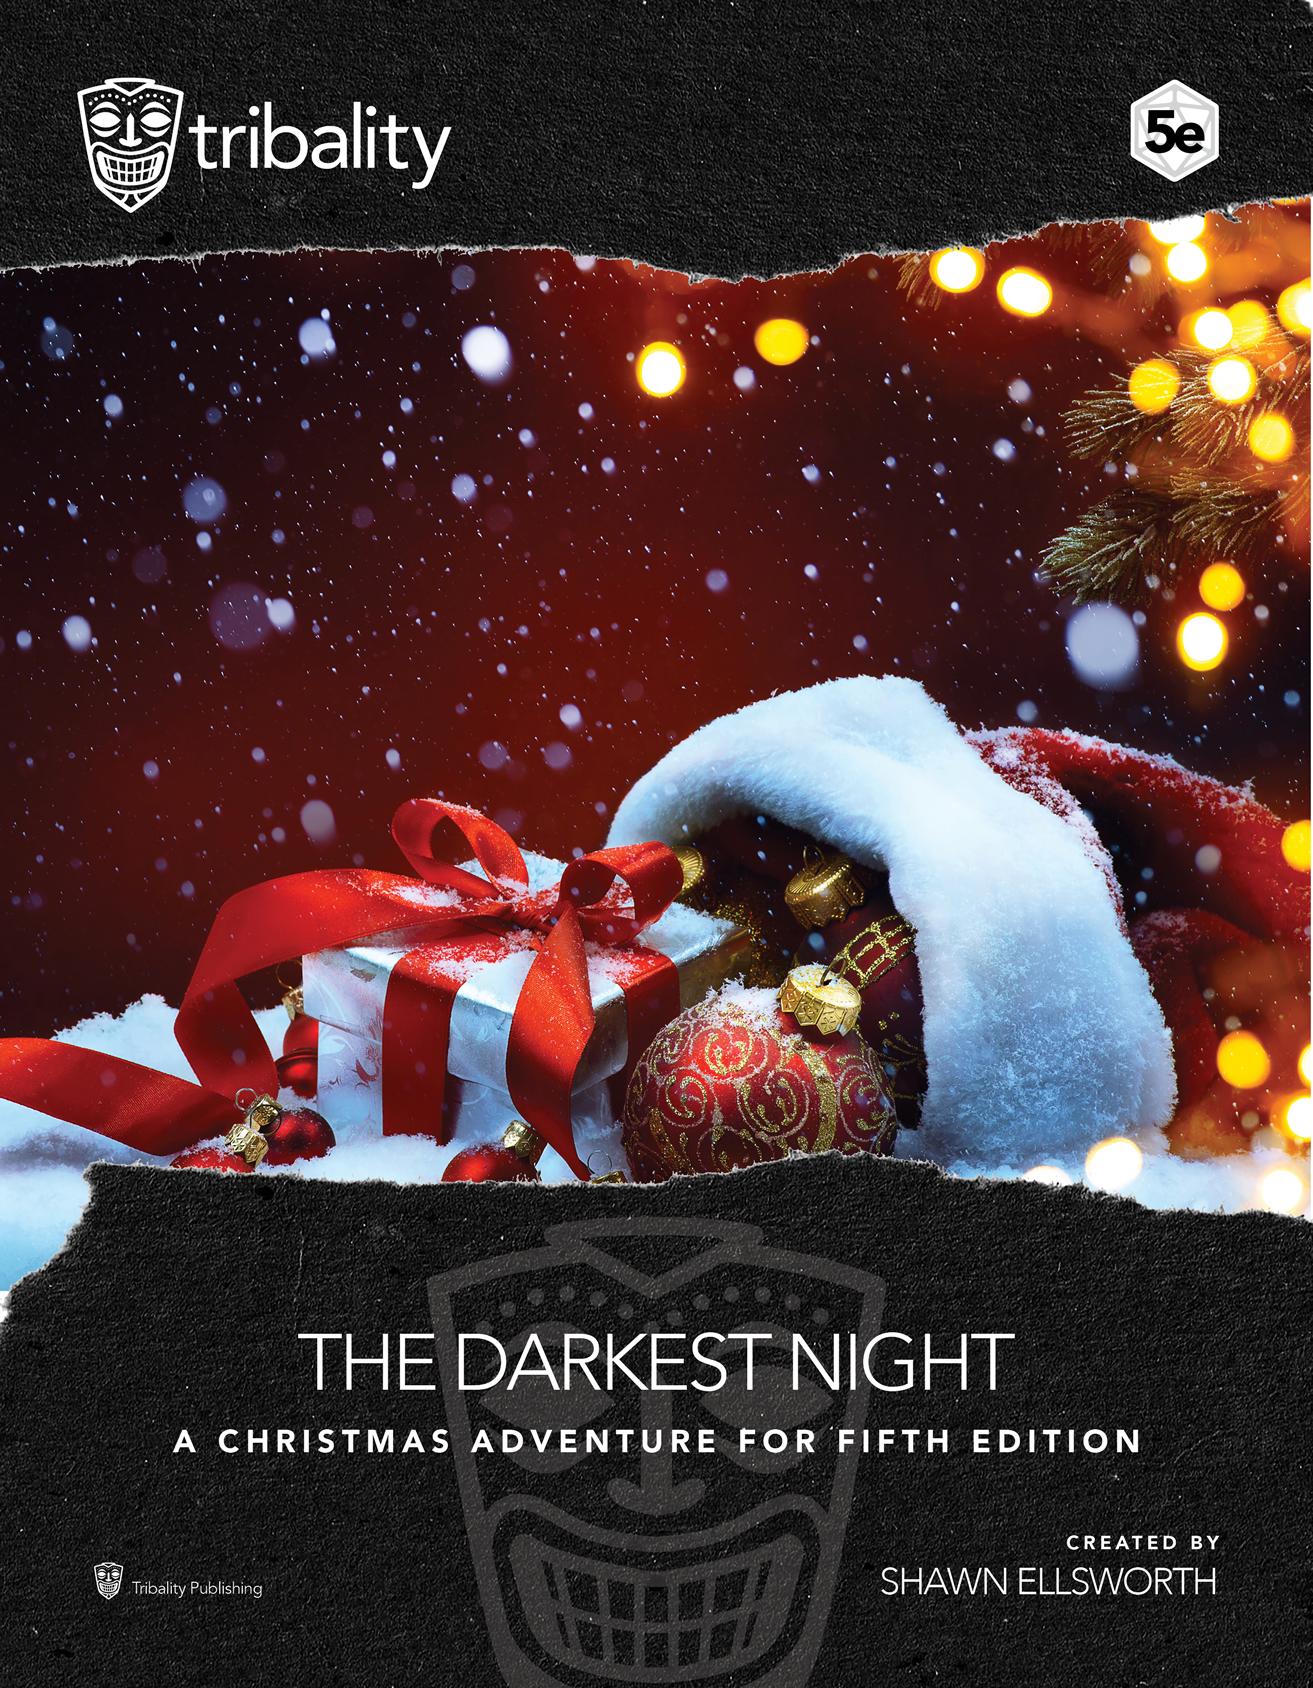 D&D 5e Christmas/Holiday Adventure - The Darkest Night - Tribality